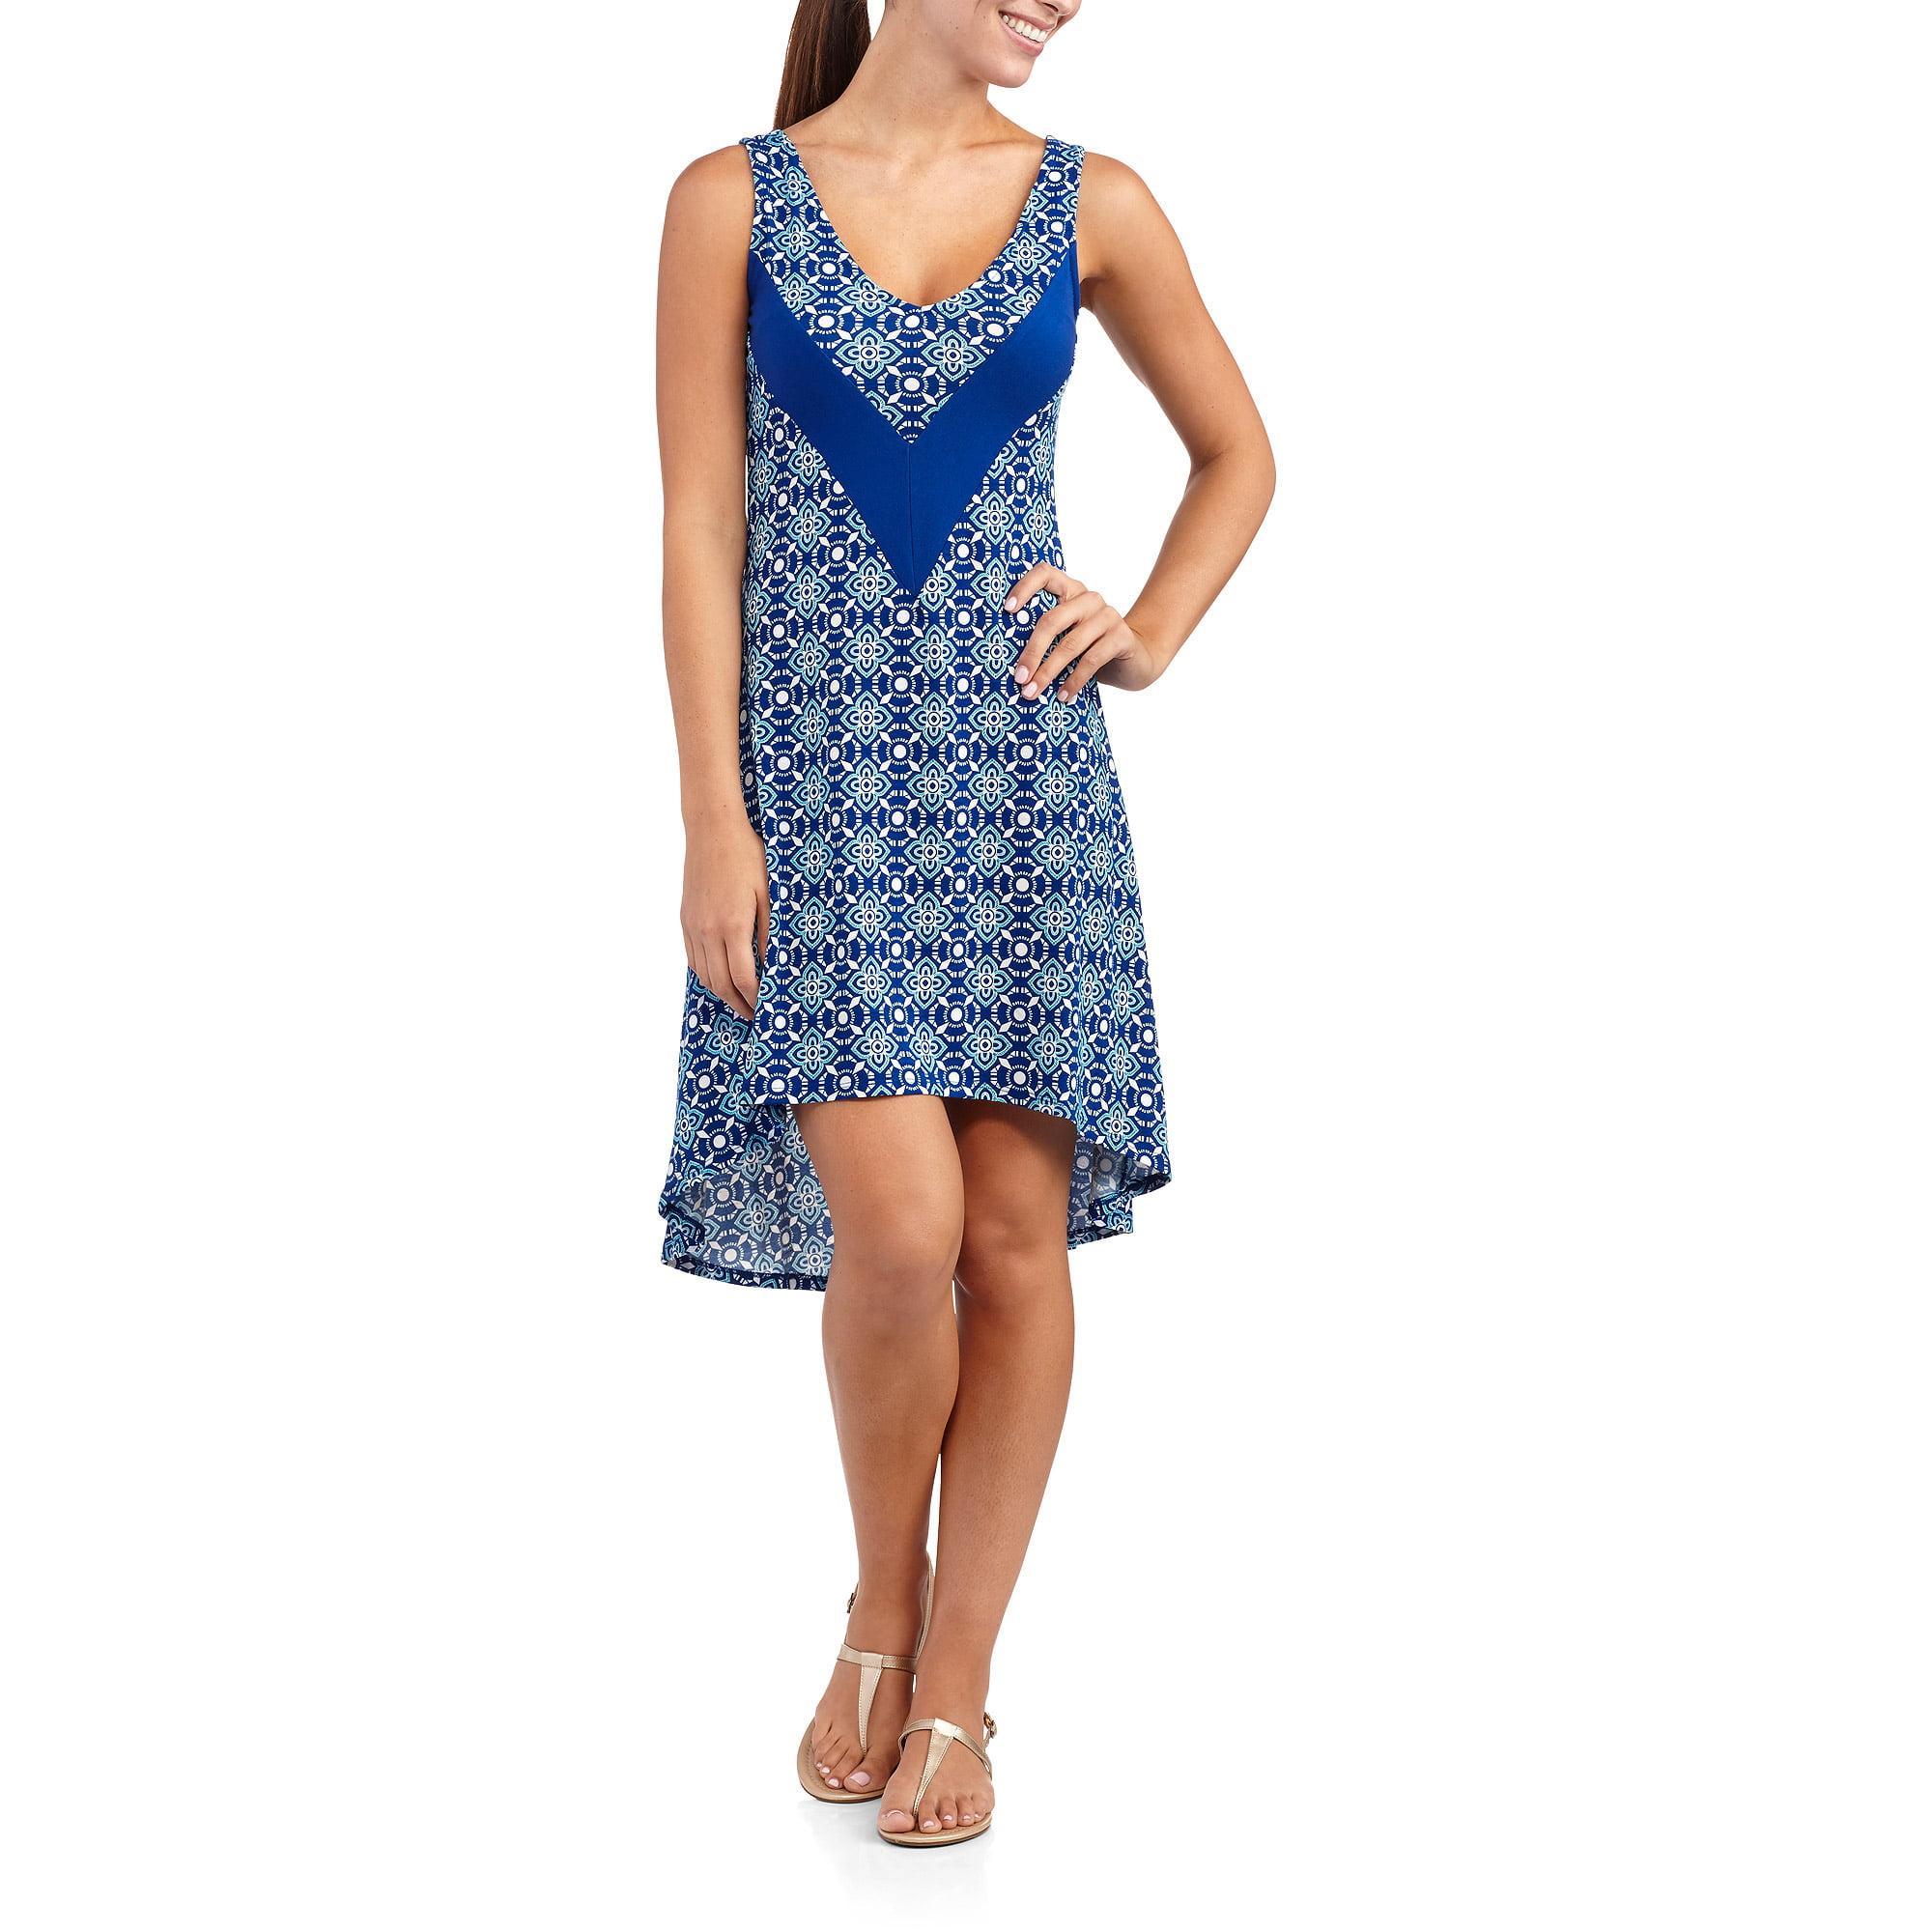 Allison Brittney Women's V-Neck Hi-Lo Tank Dress